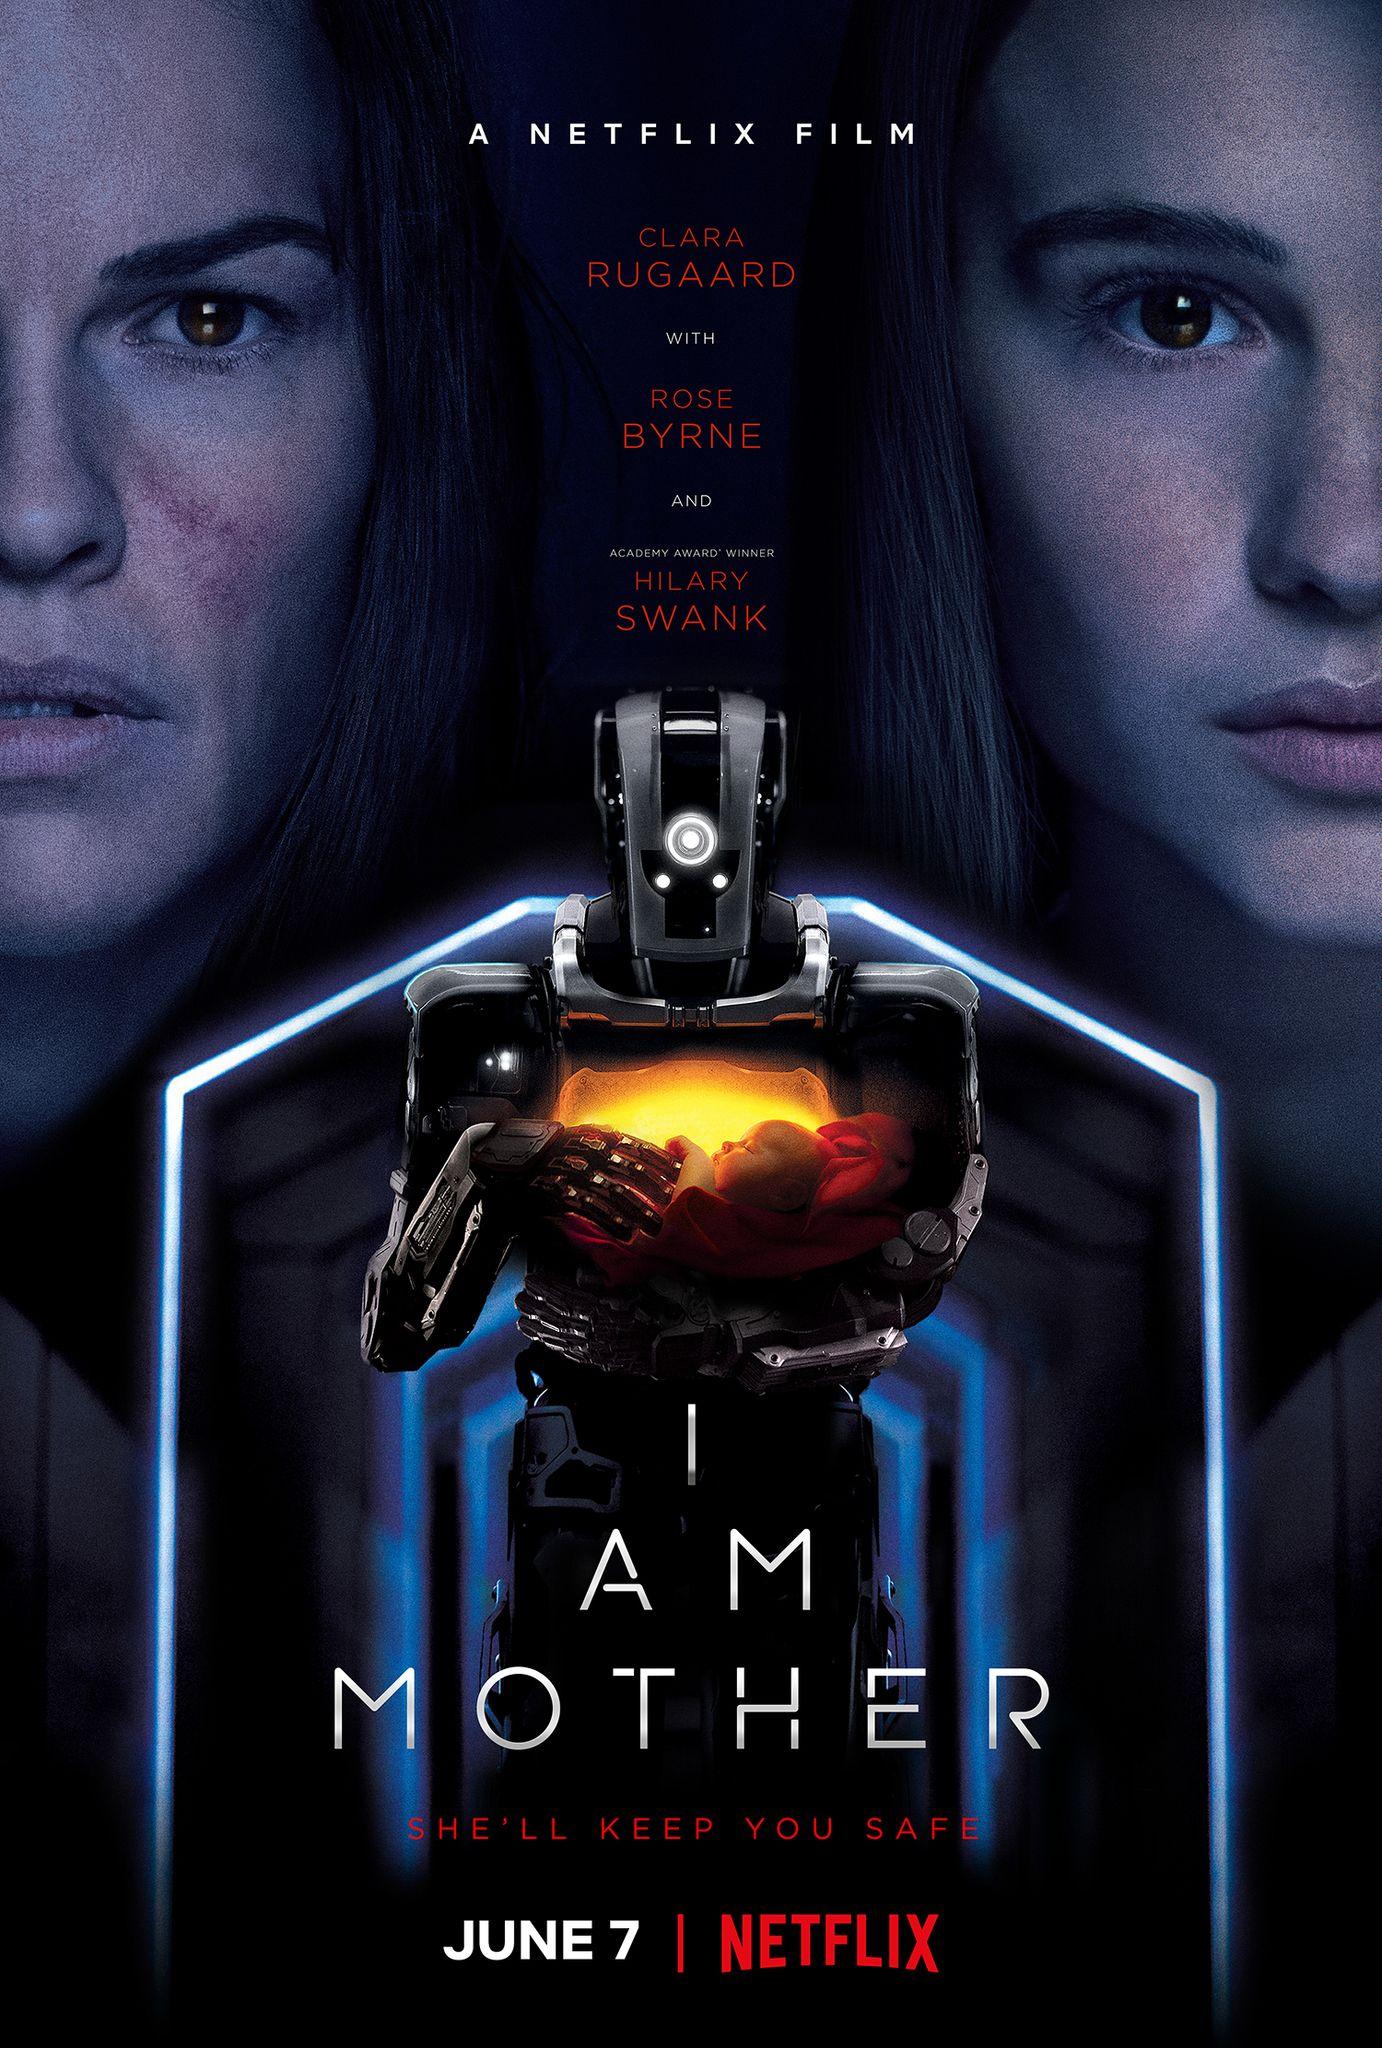 Meluk Adli Kullanicinin Movie Posters Panosundaki Pin Bilim Kurgu Filmleri Film Izleme